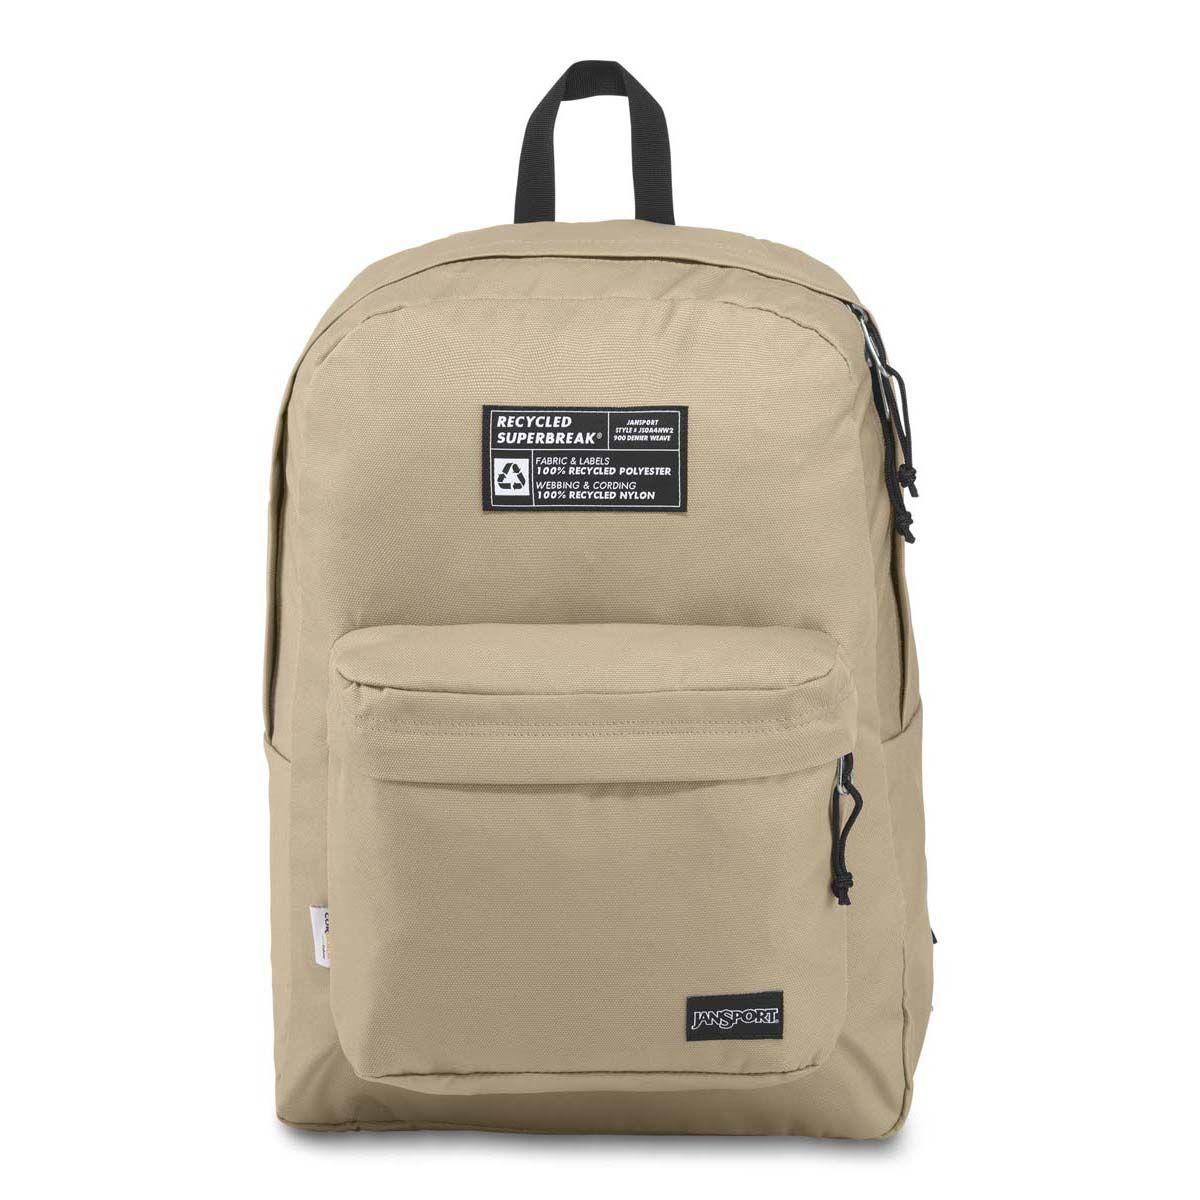 JanSport Recycled SuperBreak® Backpack in Oyster